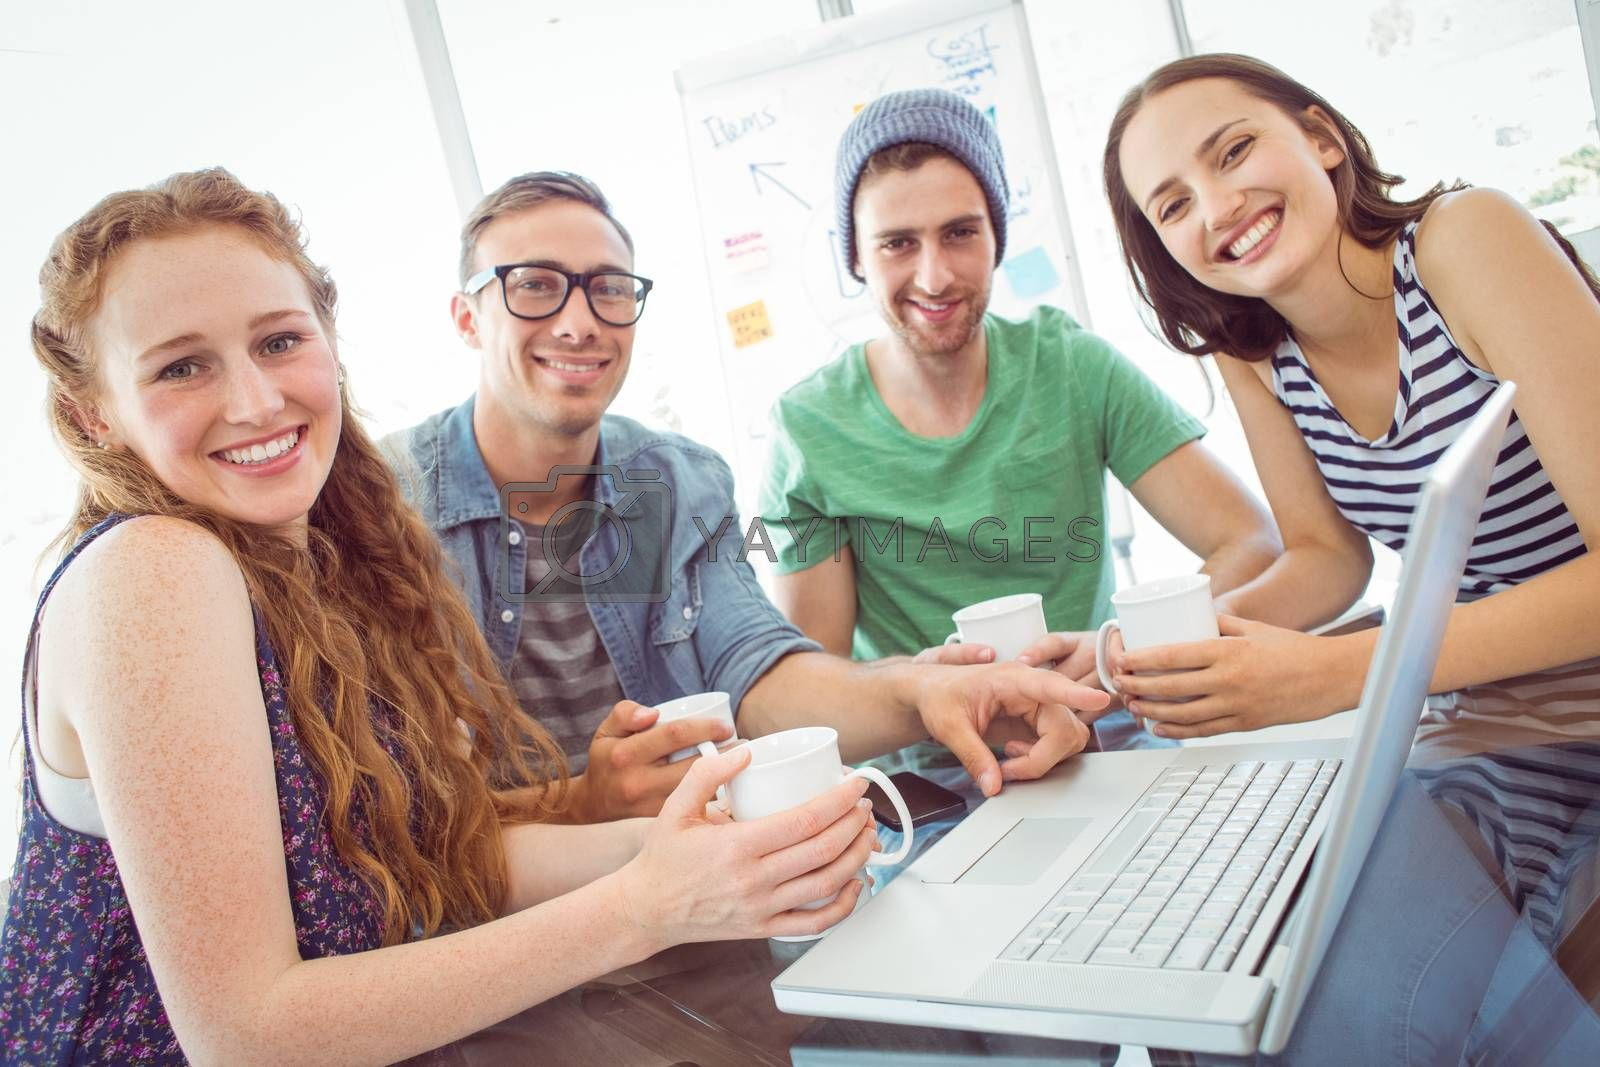 Fashion students working as a team  by Wavebreakmedia